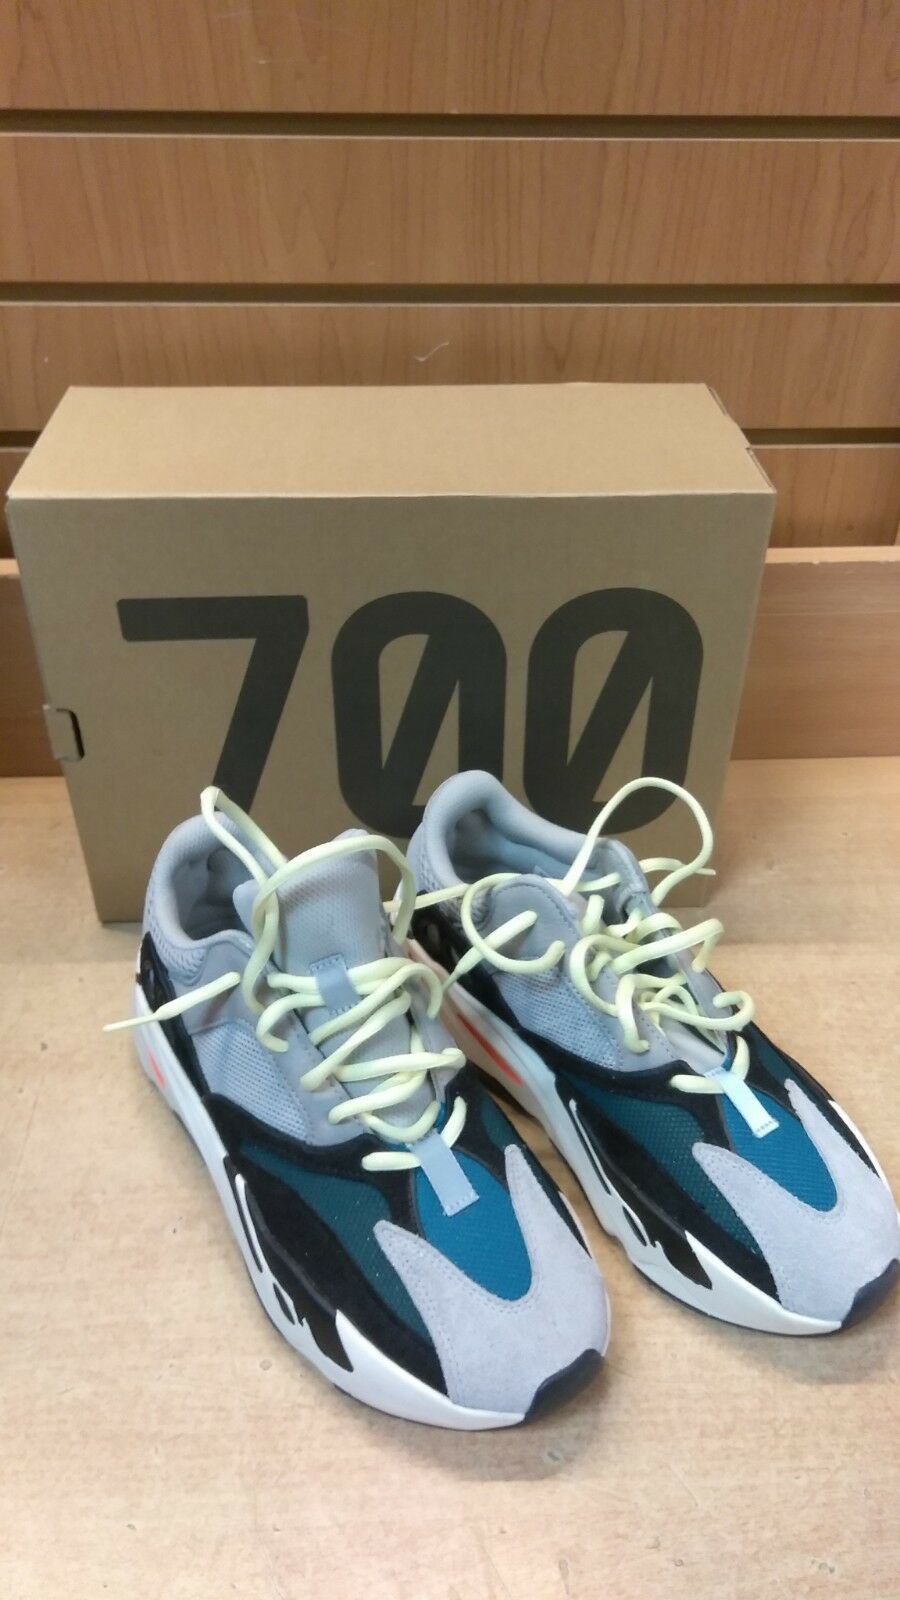 new arrival adba7 c07d4 Adidas Yeezy Boost 700 Originals Wave Runner B75571 Size 8